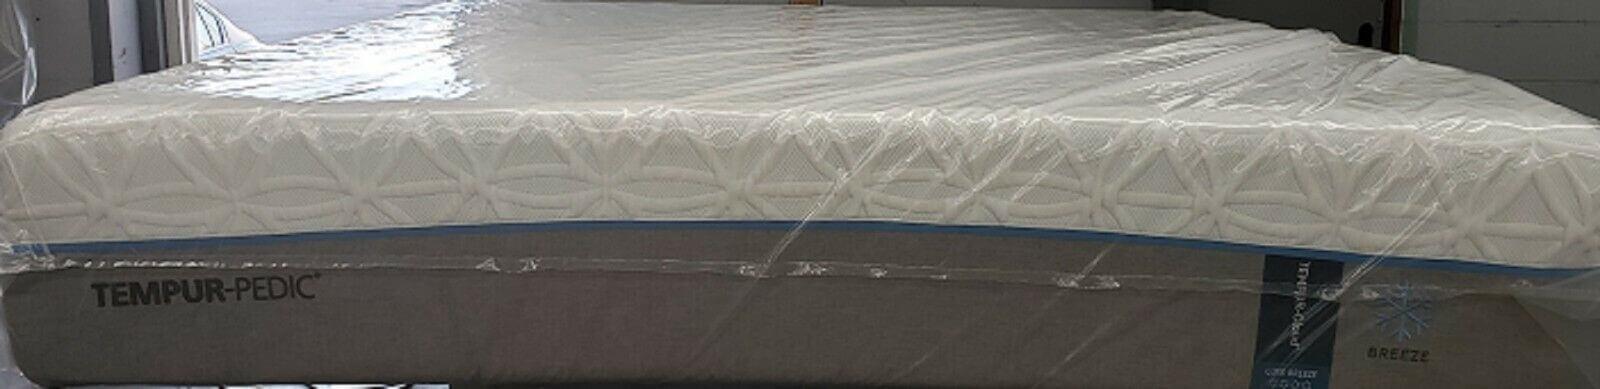 Tempur Pedic Cloud Luxe Breeze Mattress King Tampa Bay